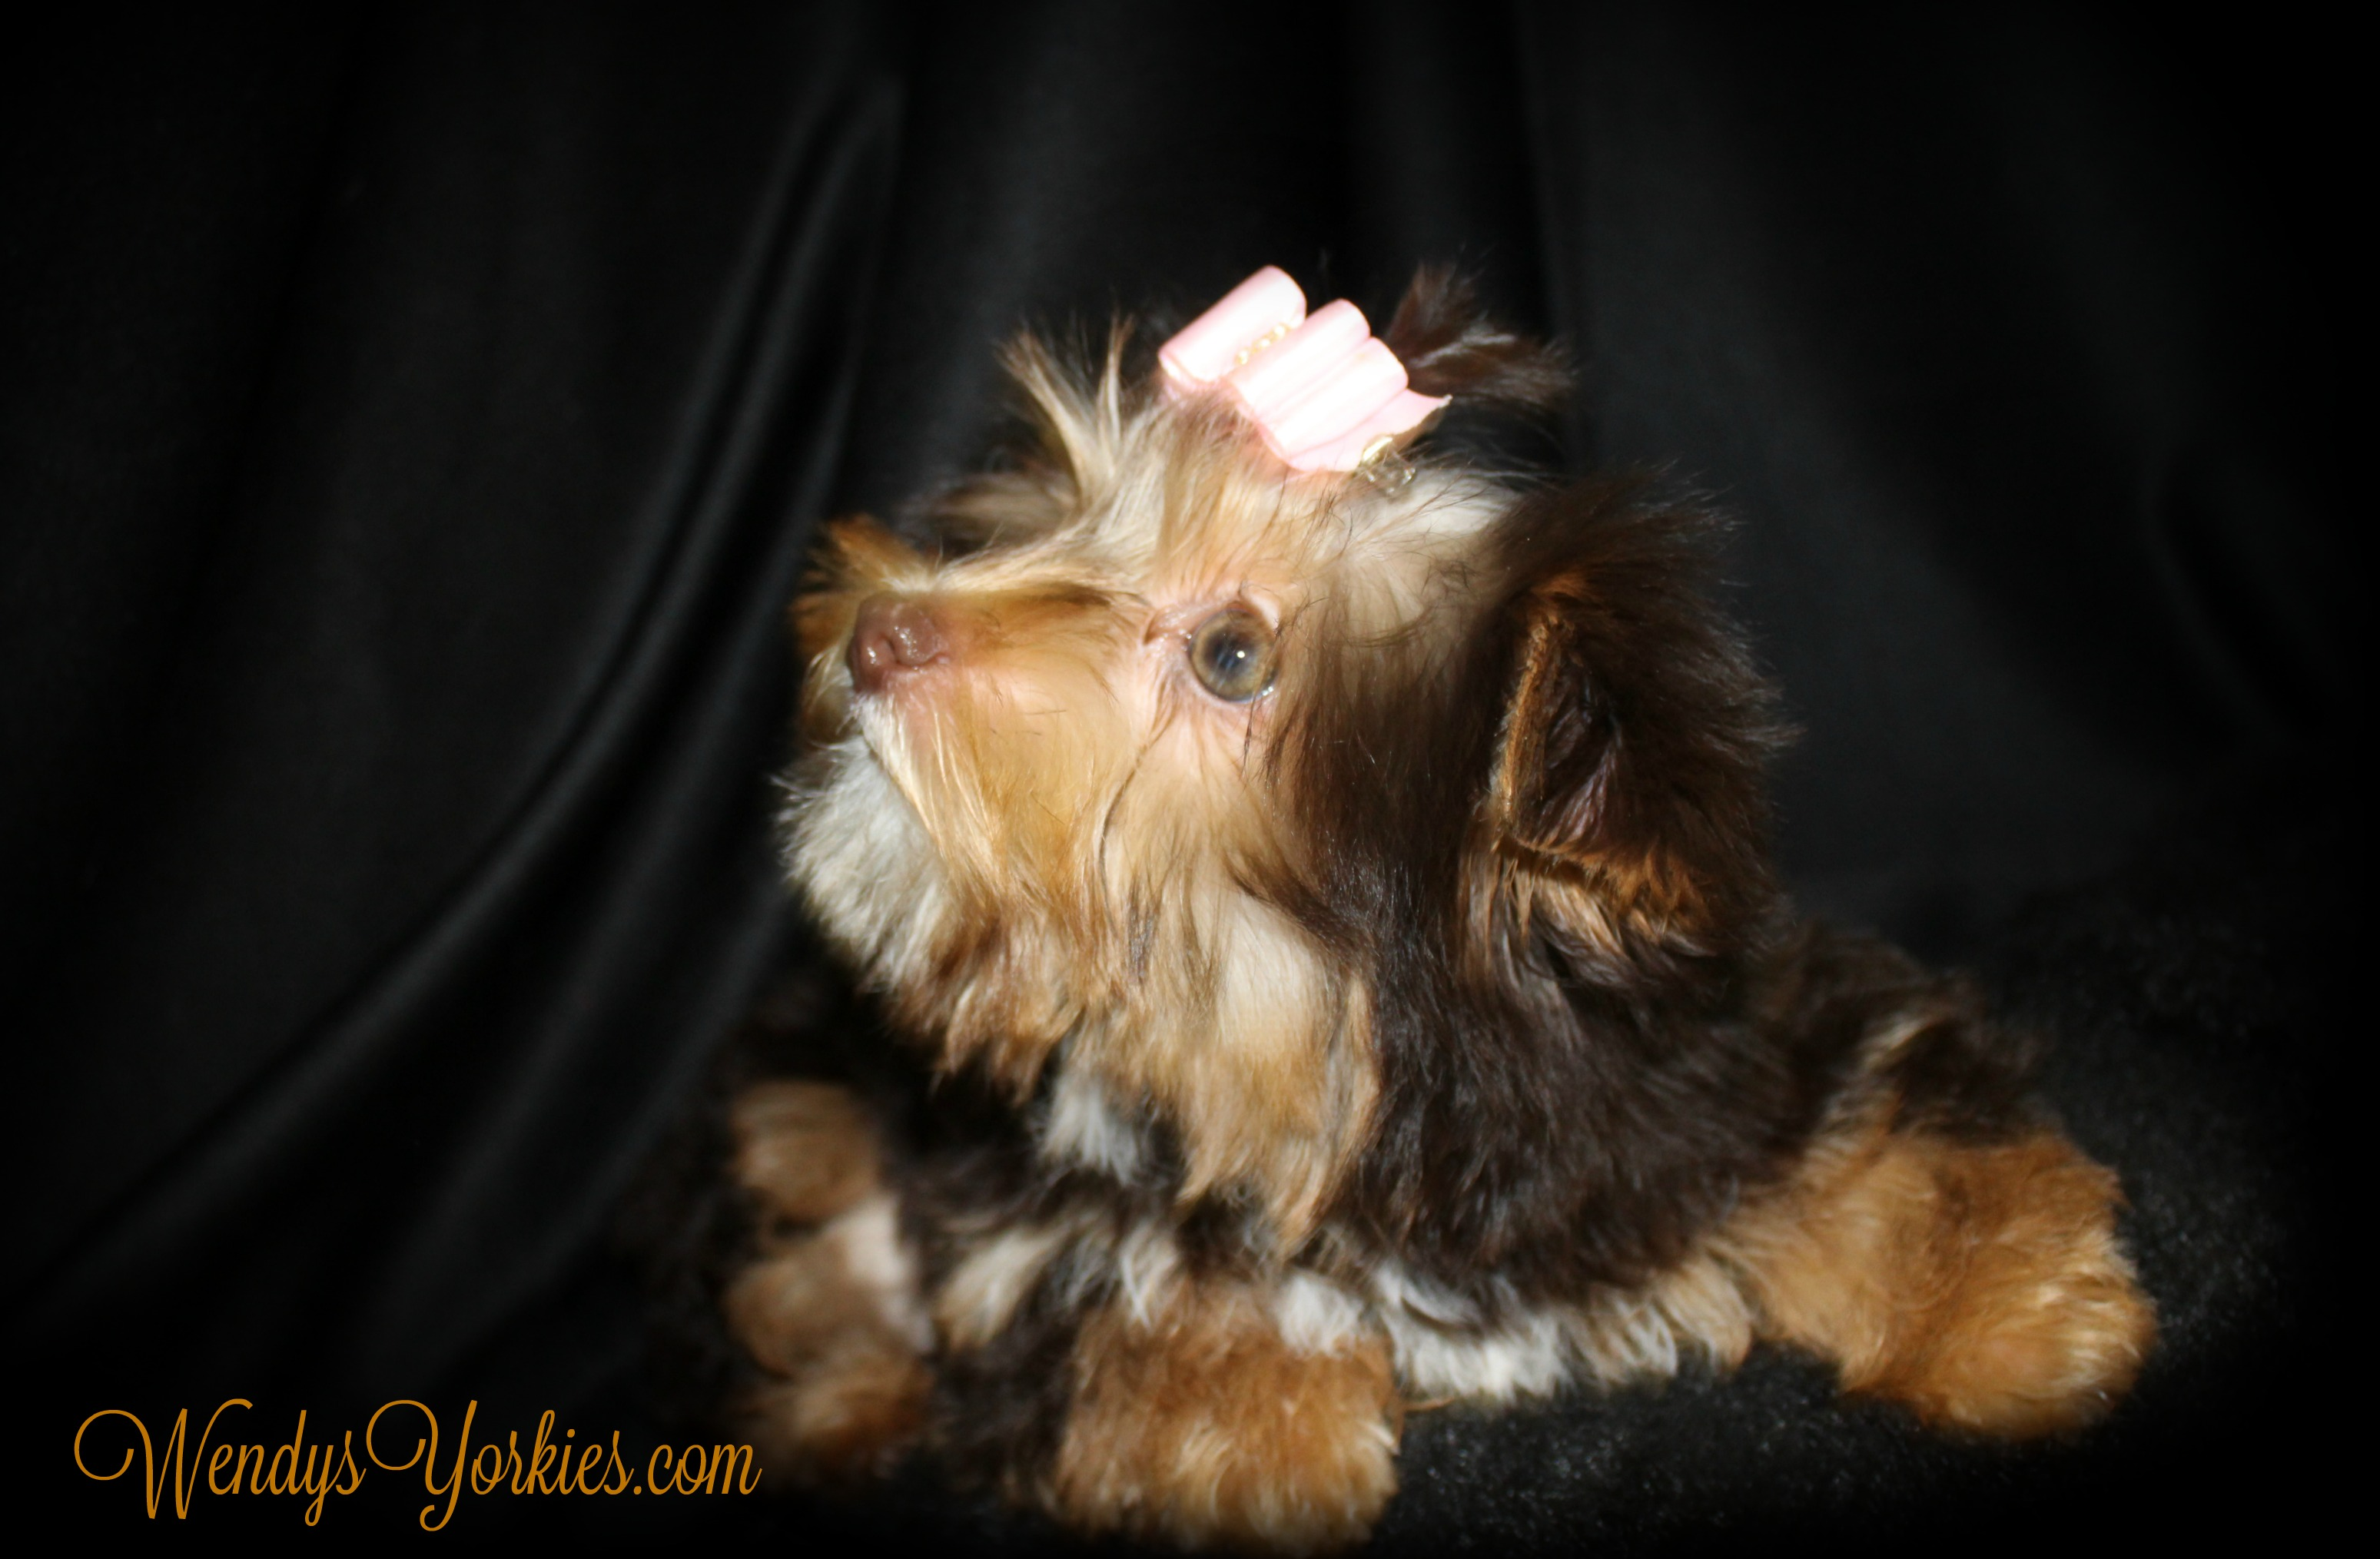 Chocolate Parti Yorkie puppy for sale, WendysYorkies.com, Allie